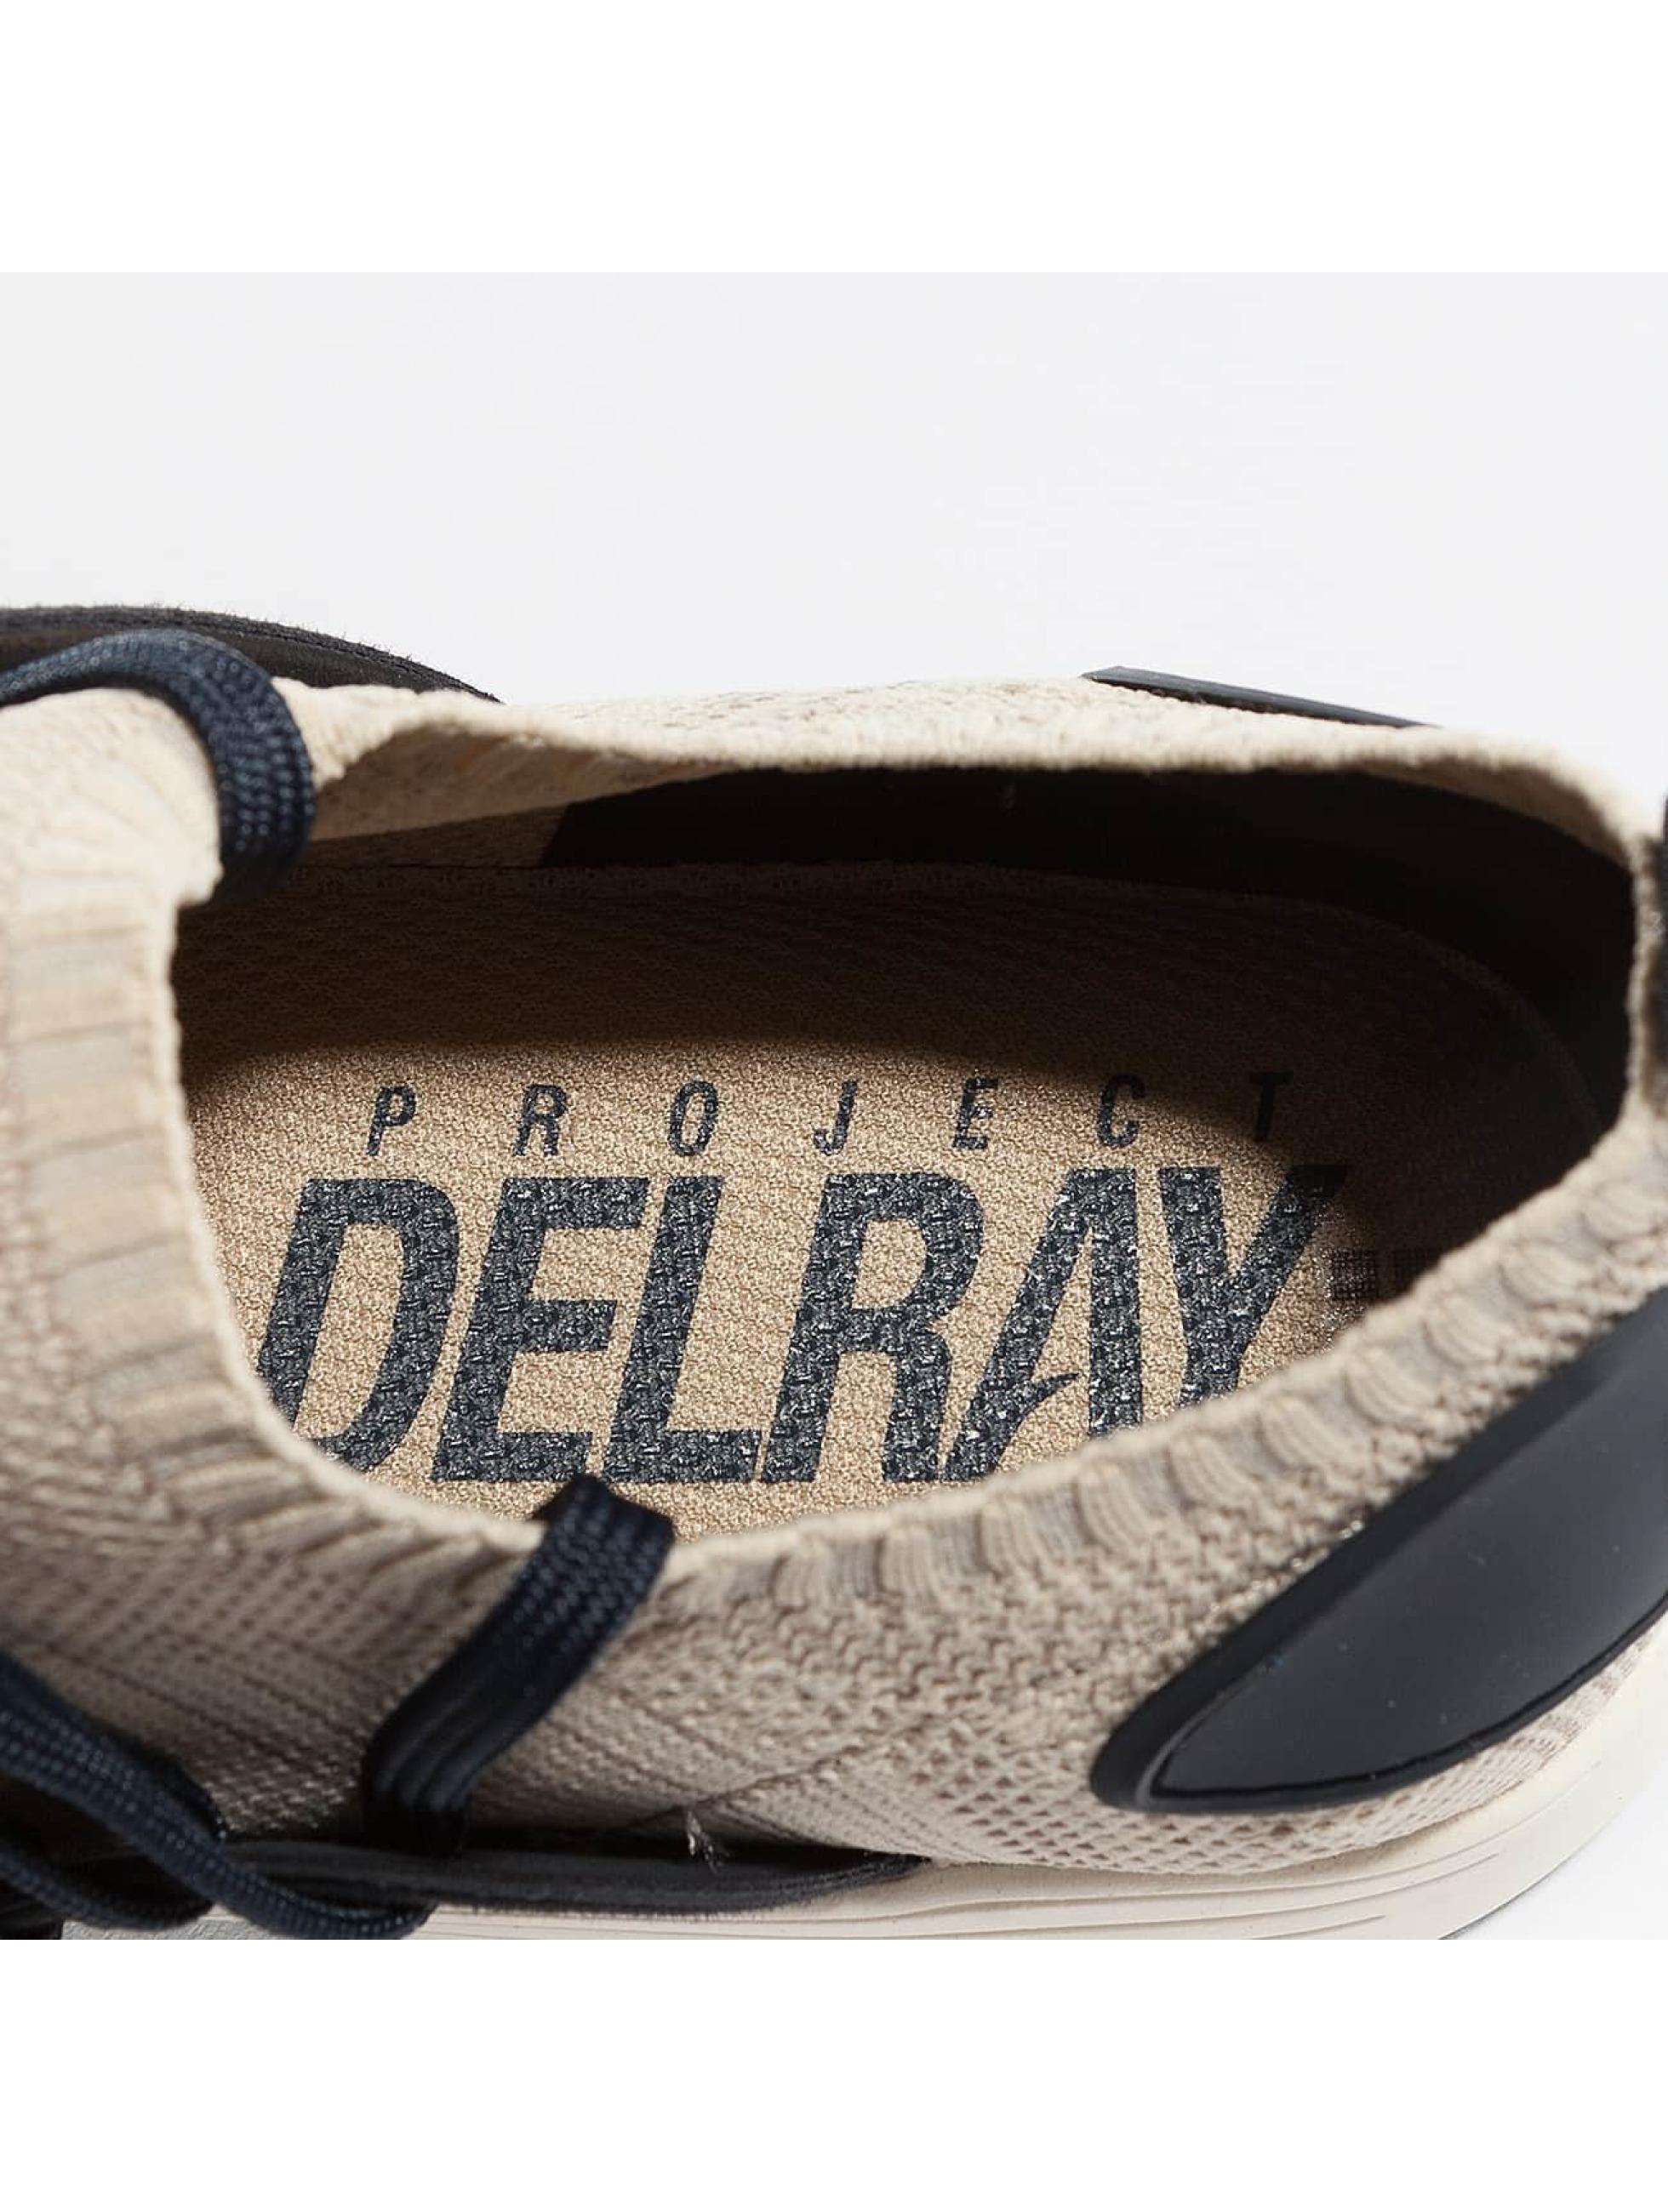 Project Delray Сникеры Wavey бежевый